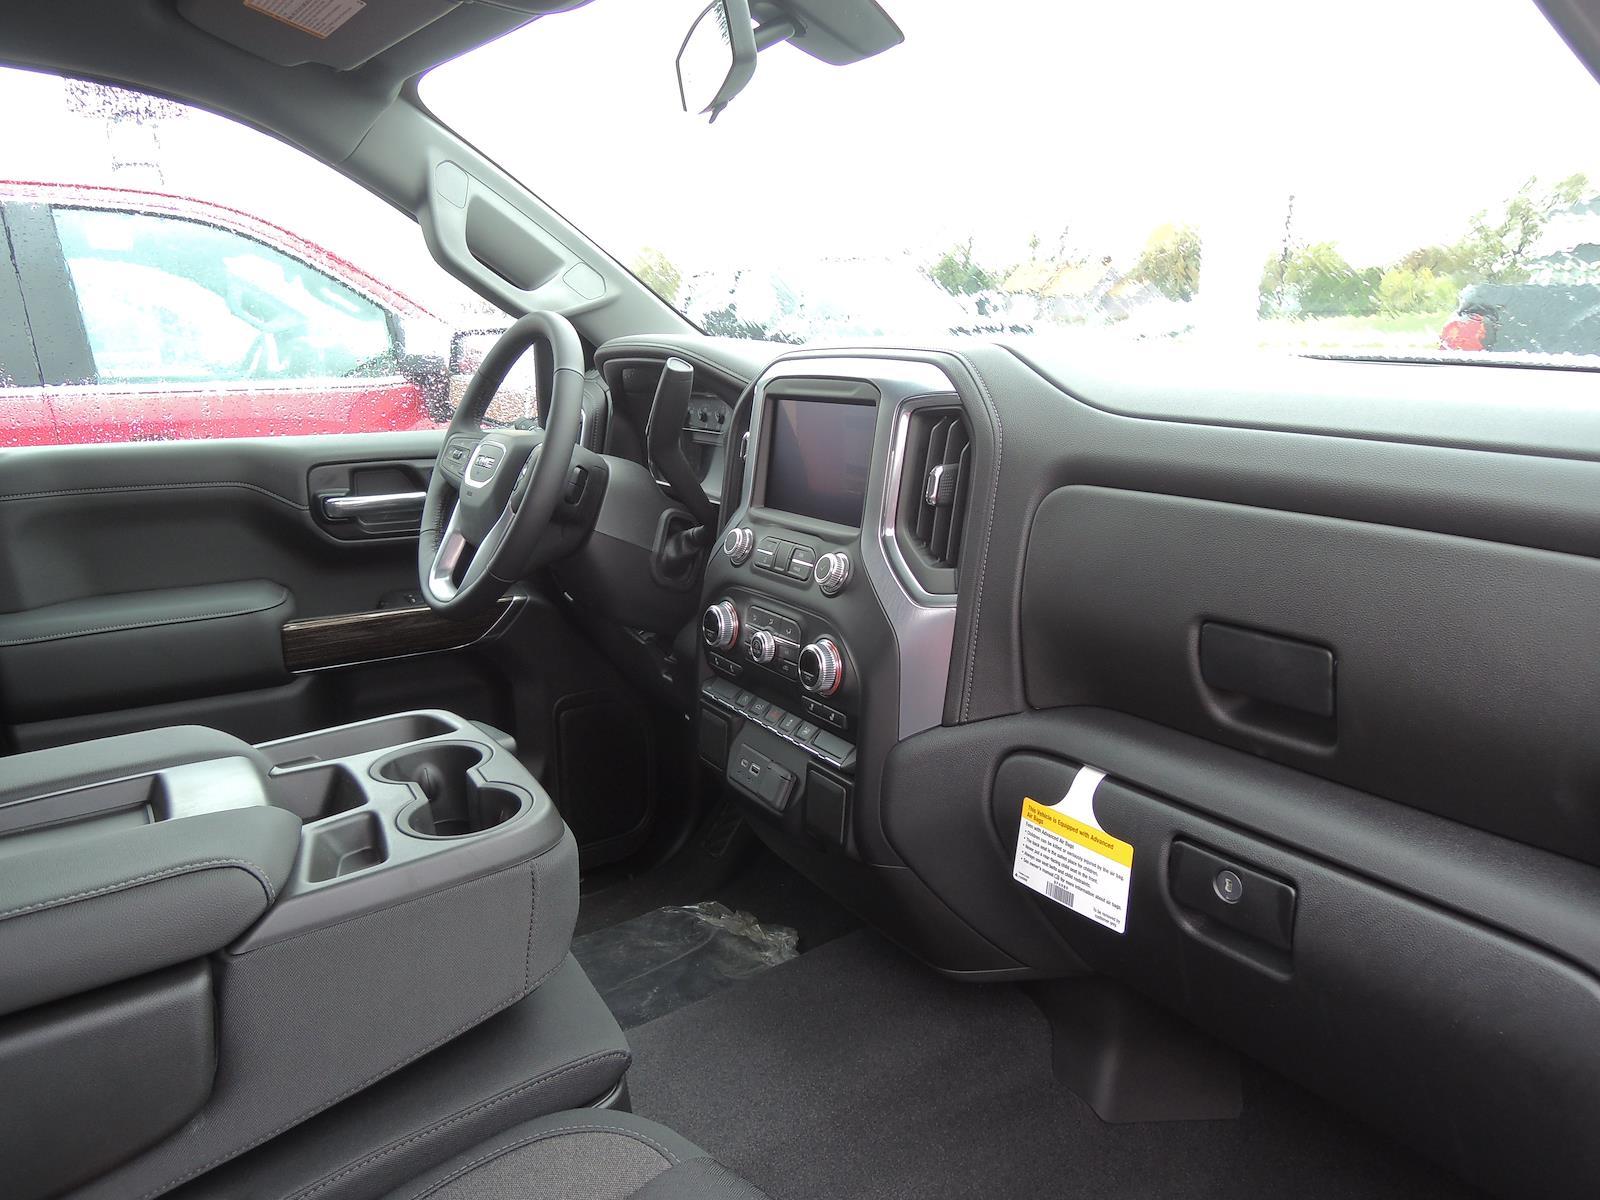 2021 GMC Sierra 1500 Crew Cab 4x4, Pickup #MT636 - photo 8